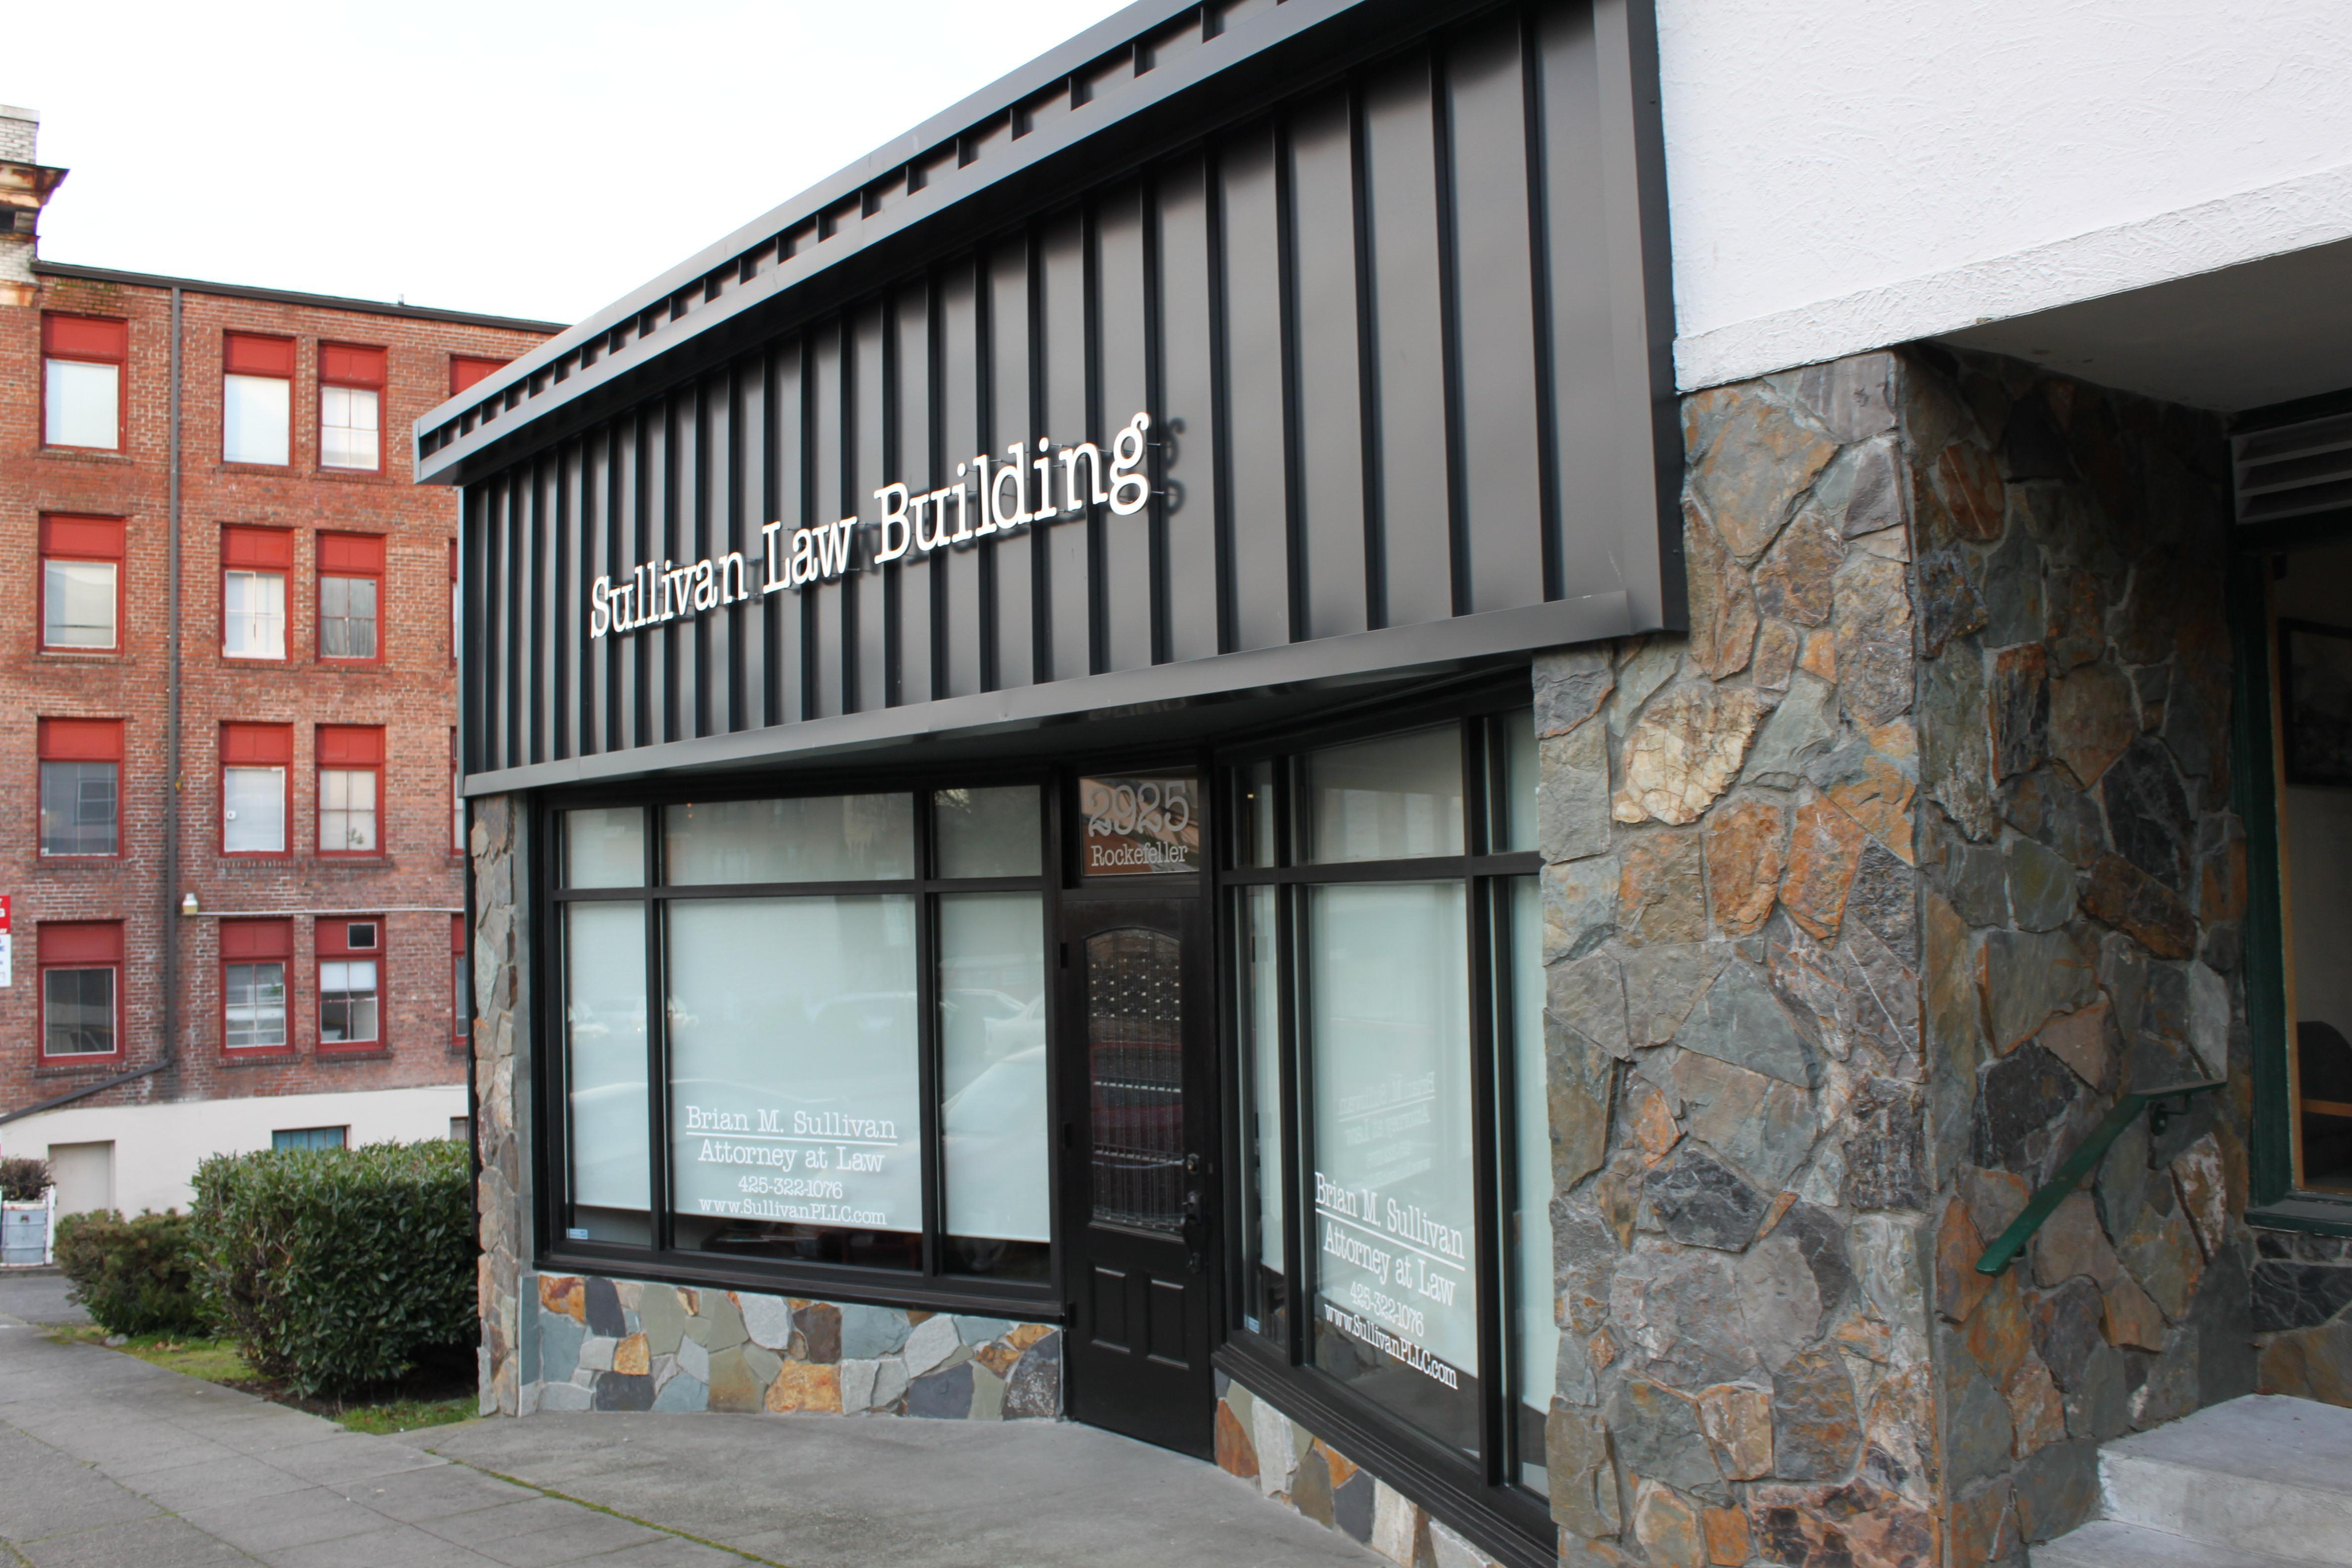 Law Office of Brian M. Sullivan image 5